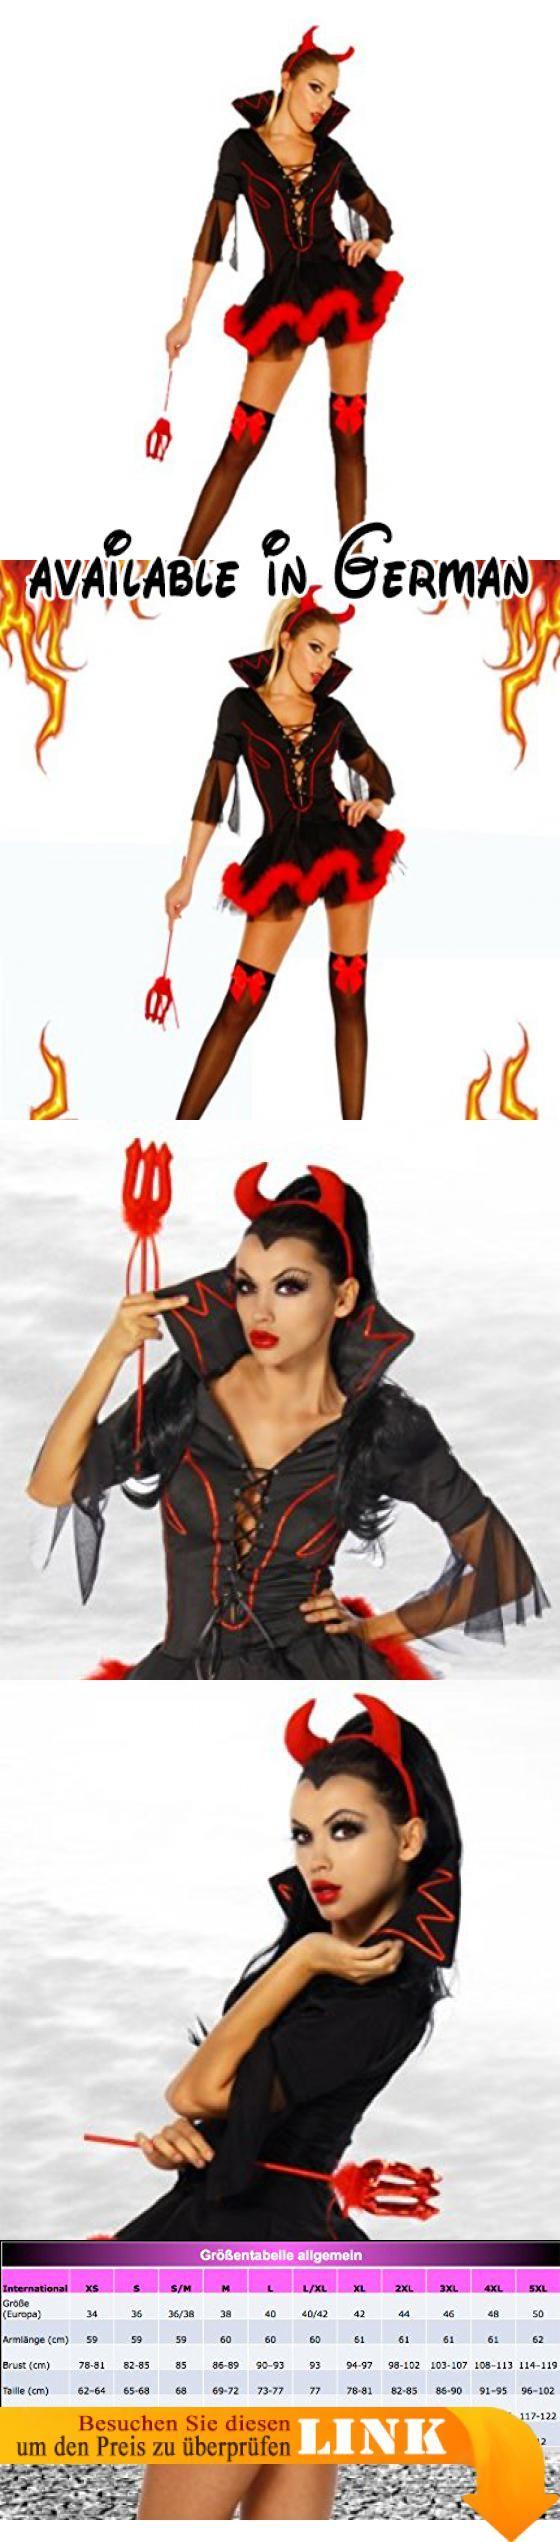 Yourdesignerz Teufels-Kostüm Damen schwarz/rot S/M.  #Apparel #DRESS